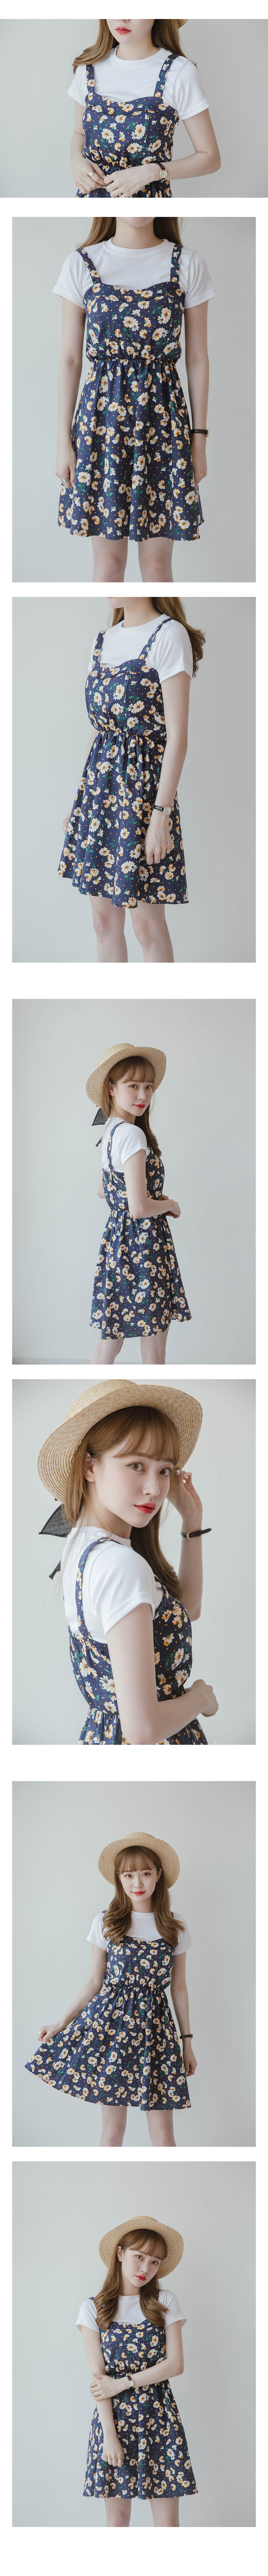 Elegant flower cap dress